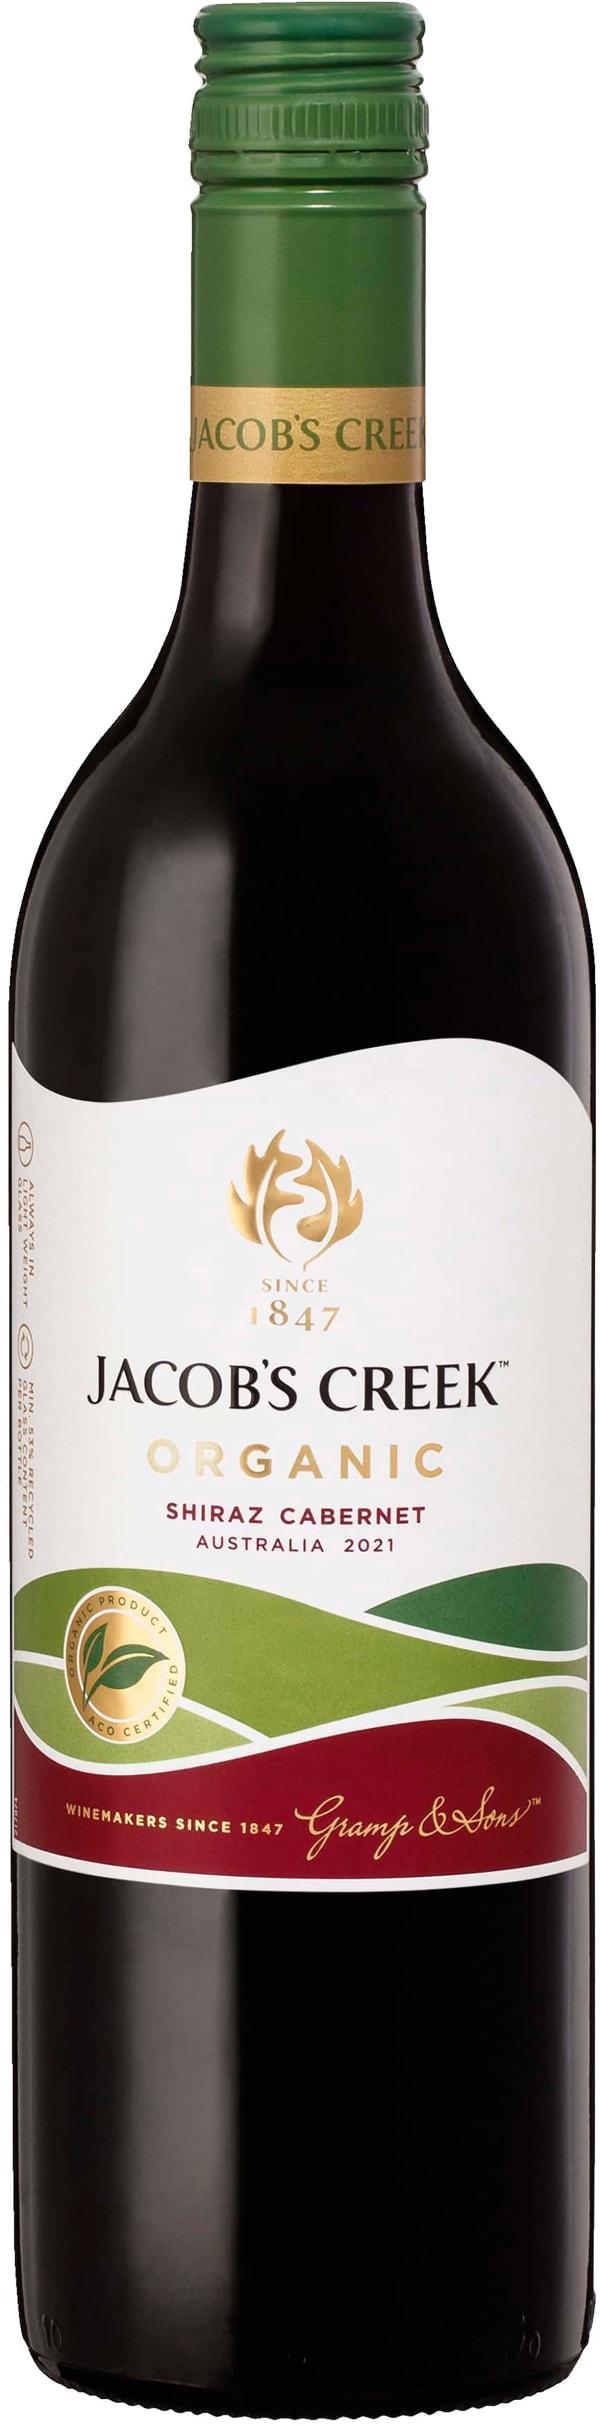 Jacob's Creek Organic Shiraz Cabernet 2018